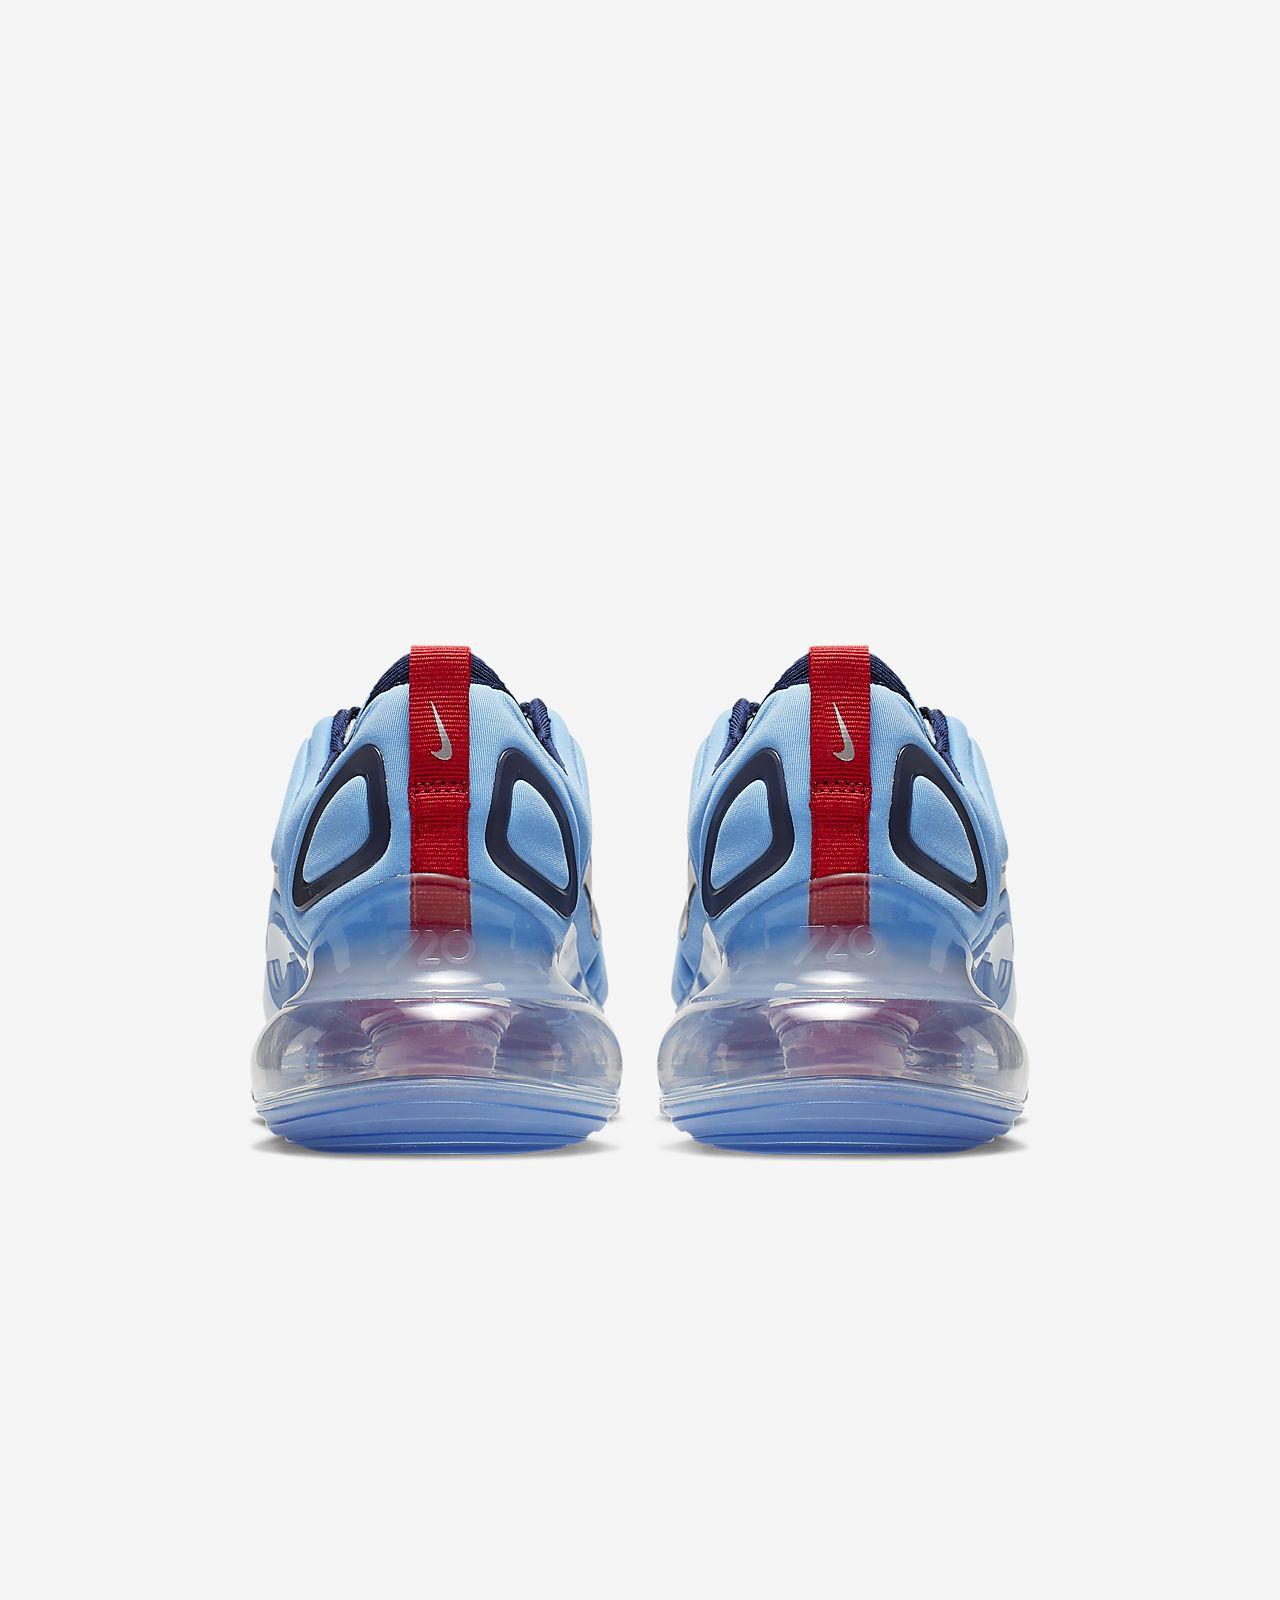 84db903685 Scarpa Nike Air Max 720 - Donna. Nike.com IT